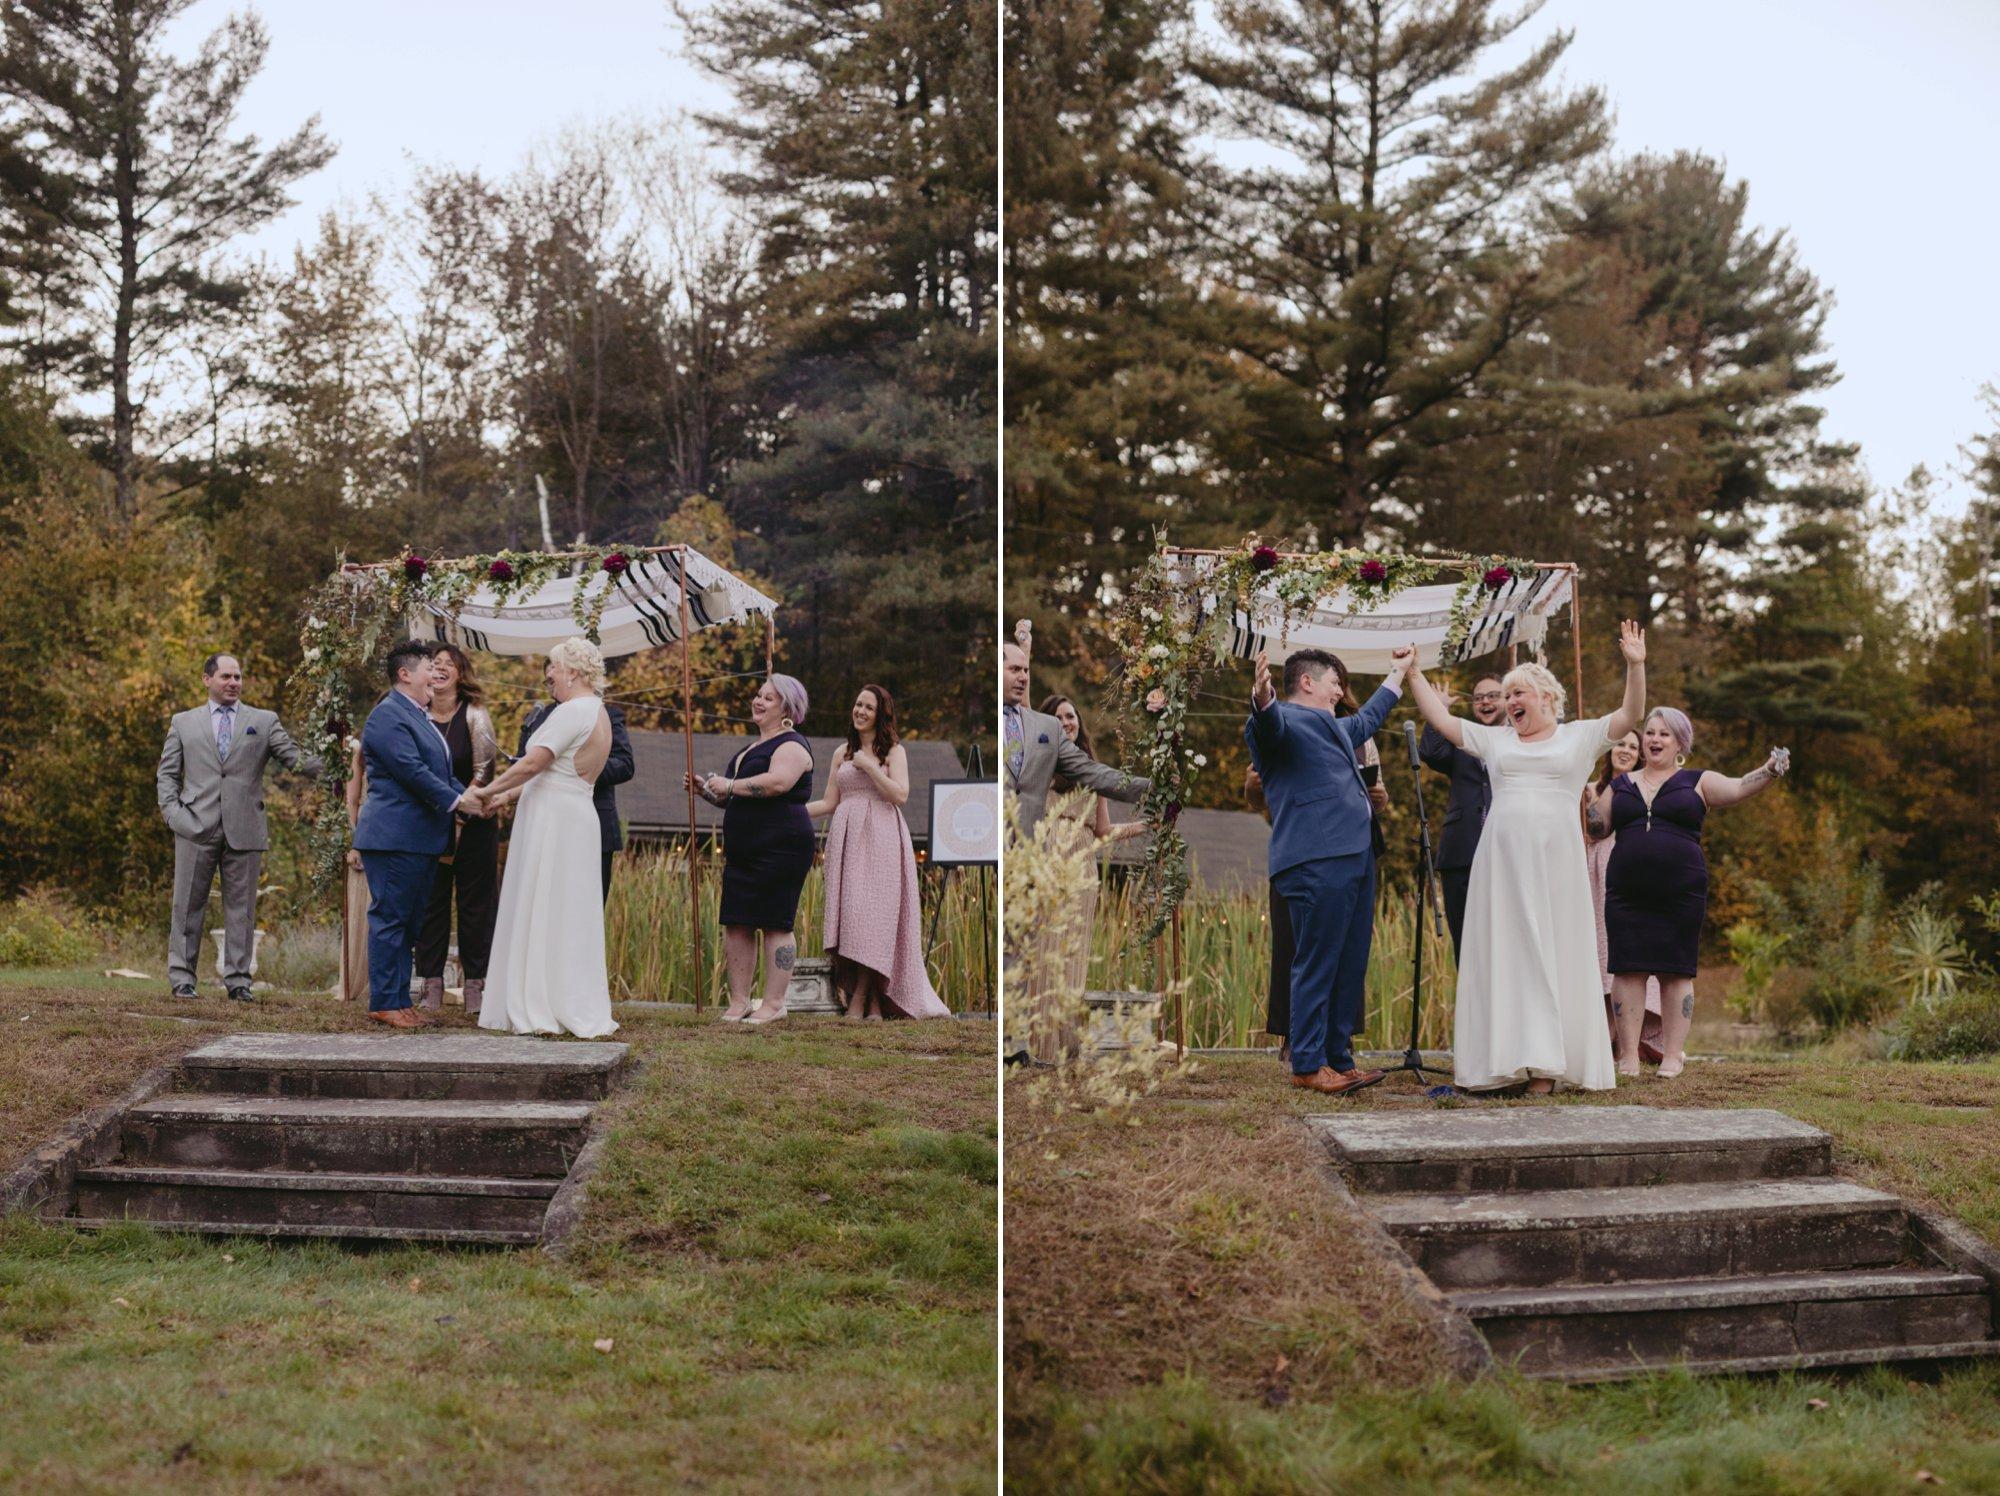 October Jewish lesbian wedding at Foxfire Mountain House in Upstate New York. Brides celebrating under chuppah.